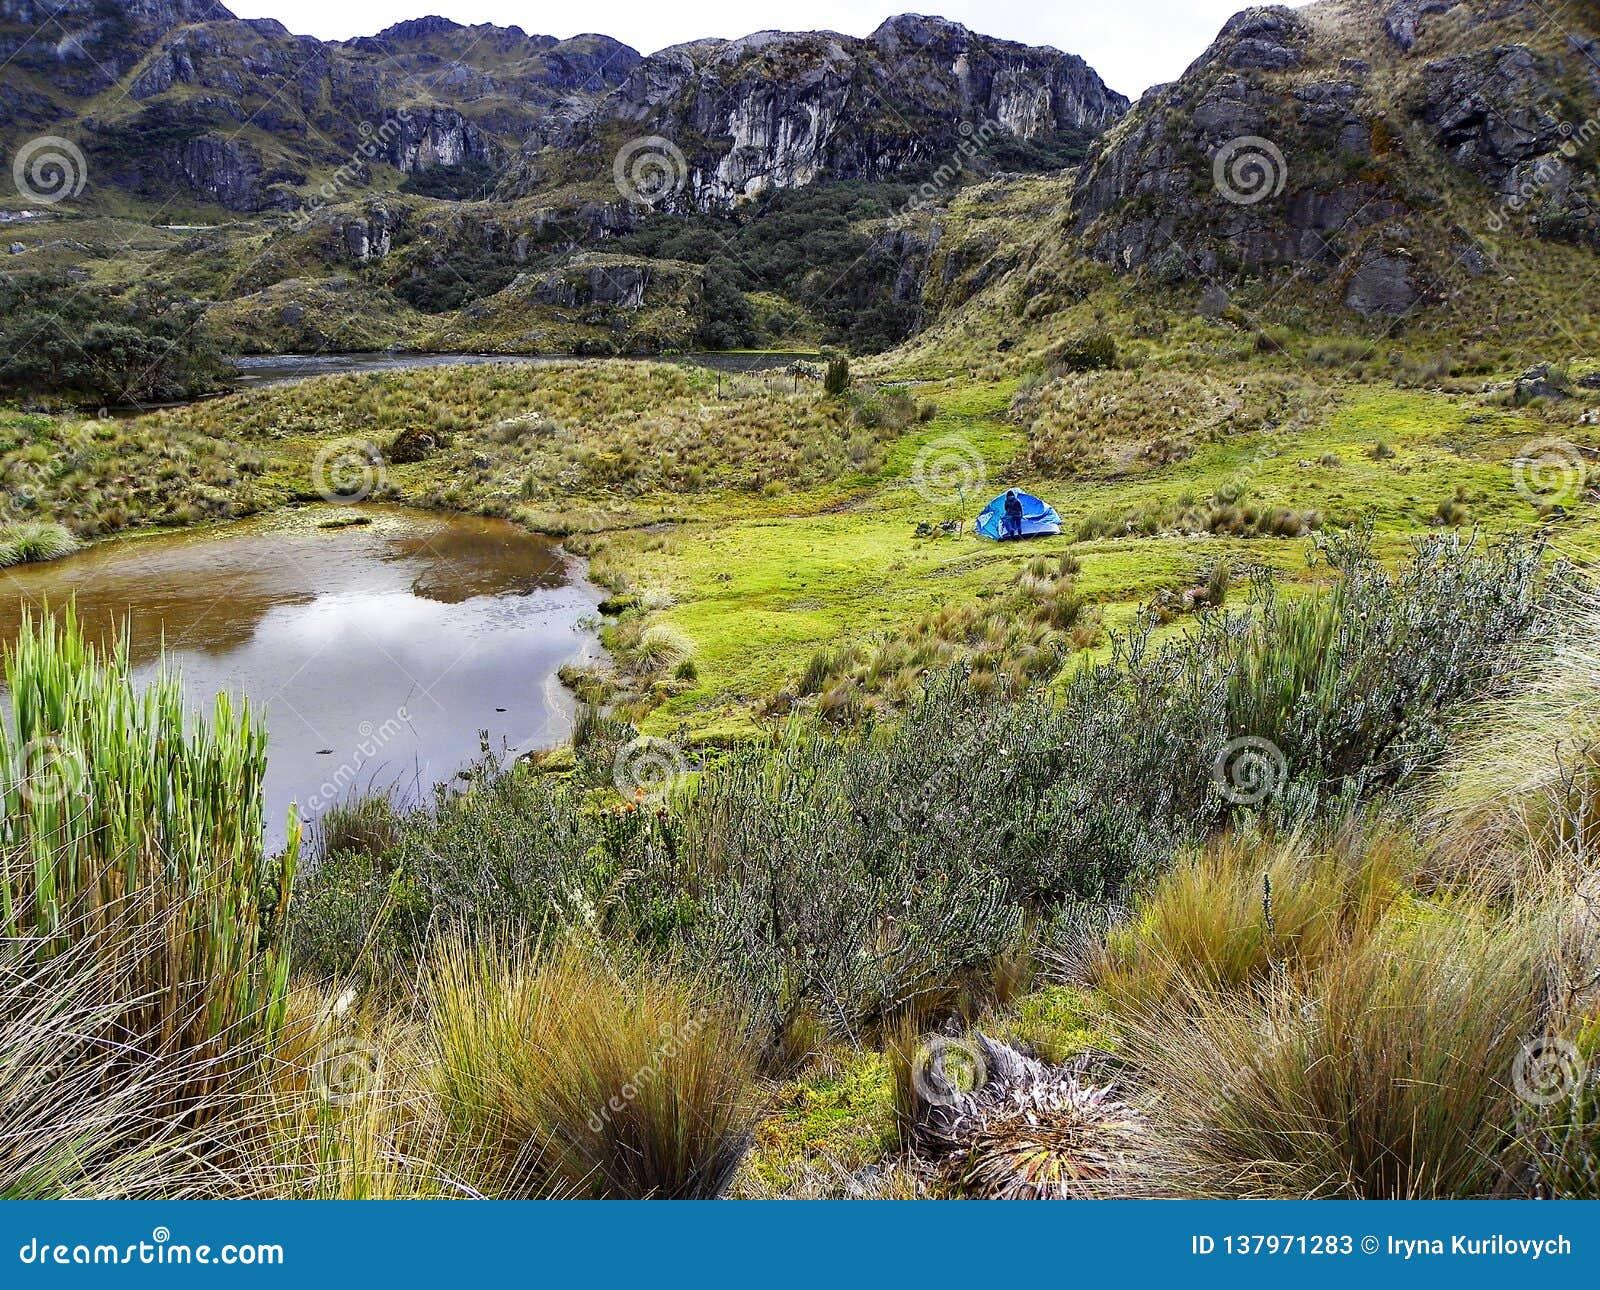 Toreadora lake lagoon and camping at National Park El Cajas, Andean Highlands, Ecuador